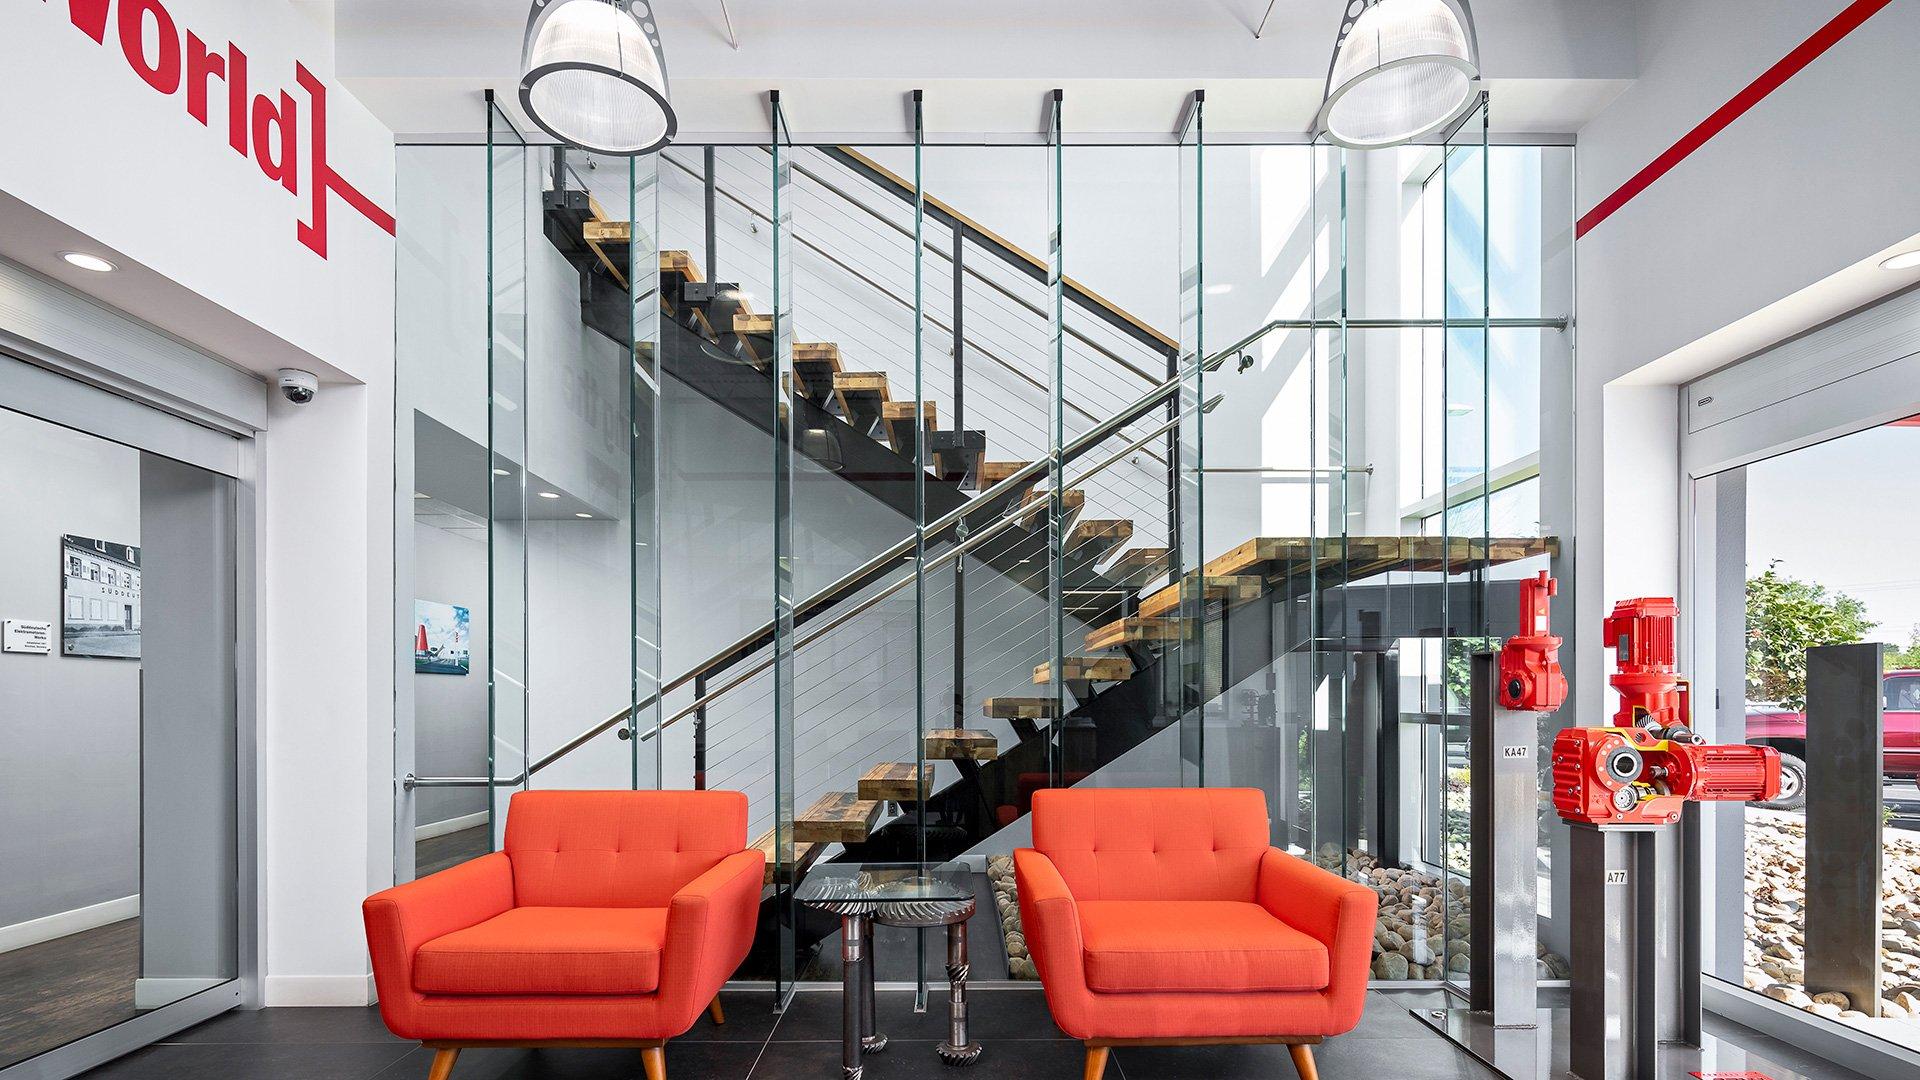 SEW-Eurodrive, East Lobby and Office Renovation